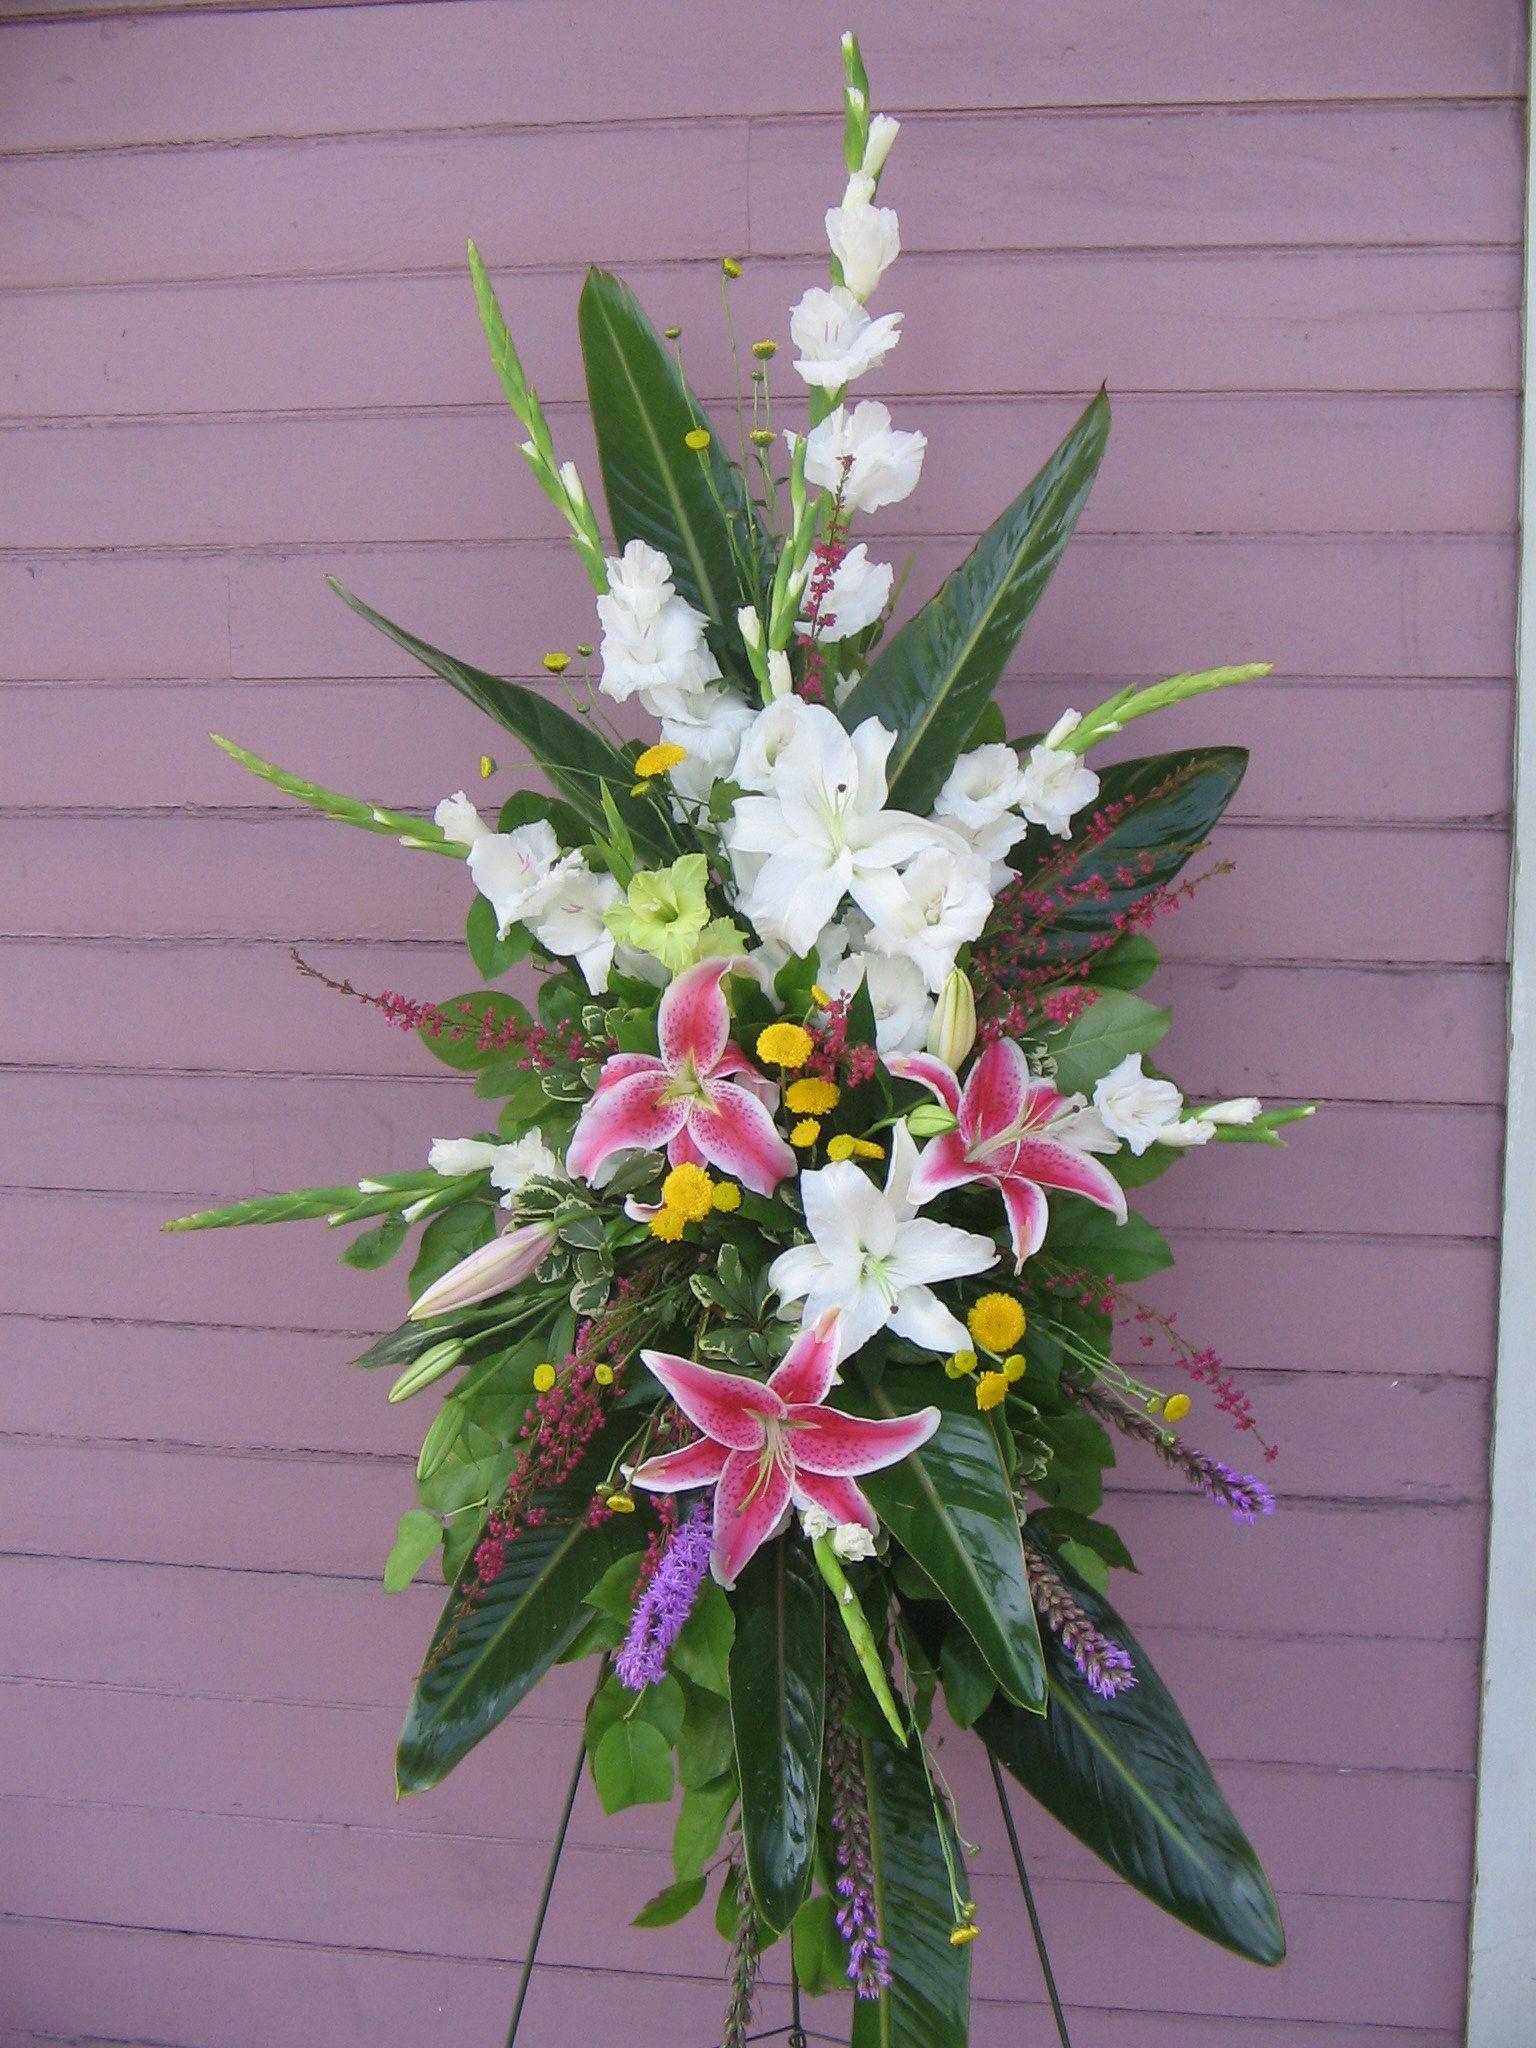 Funeral spray funeral flowers standing sprays flower shop ideas funeral spray funeral flowers standing sprays izmirmasajfo